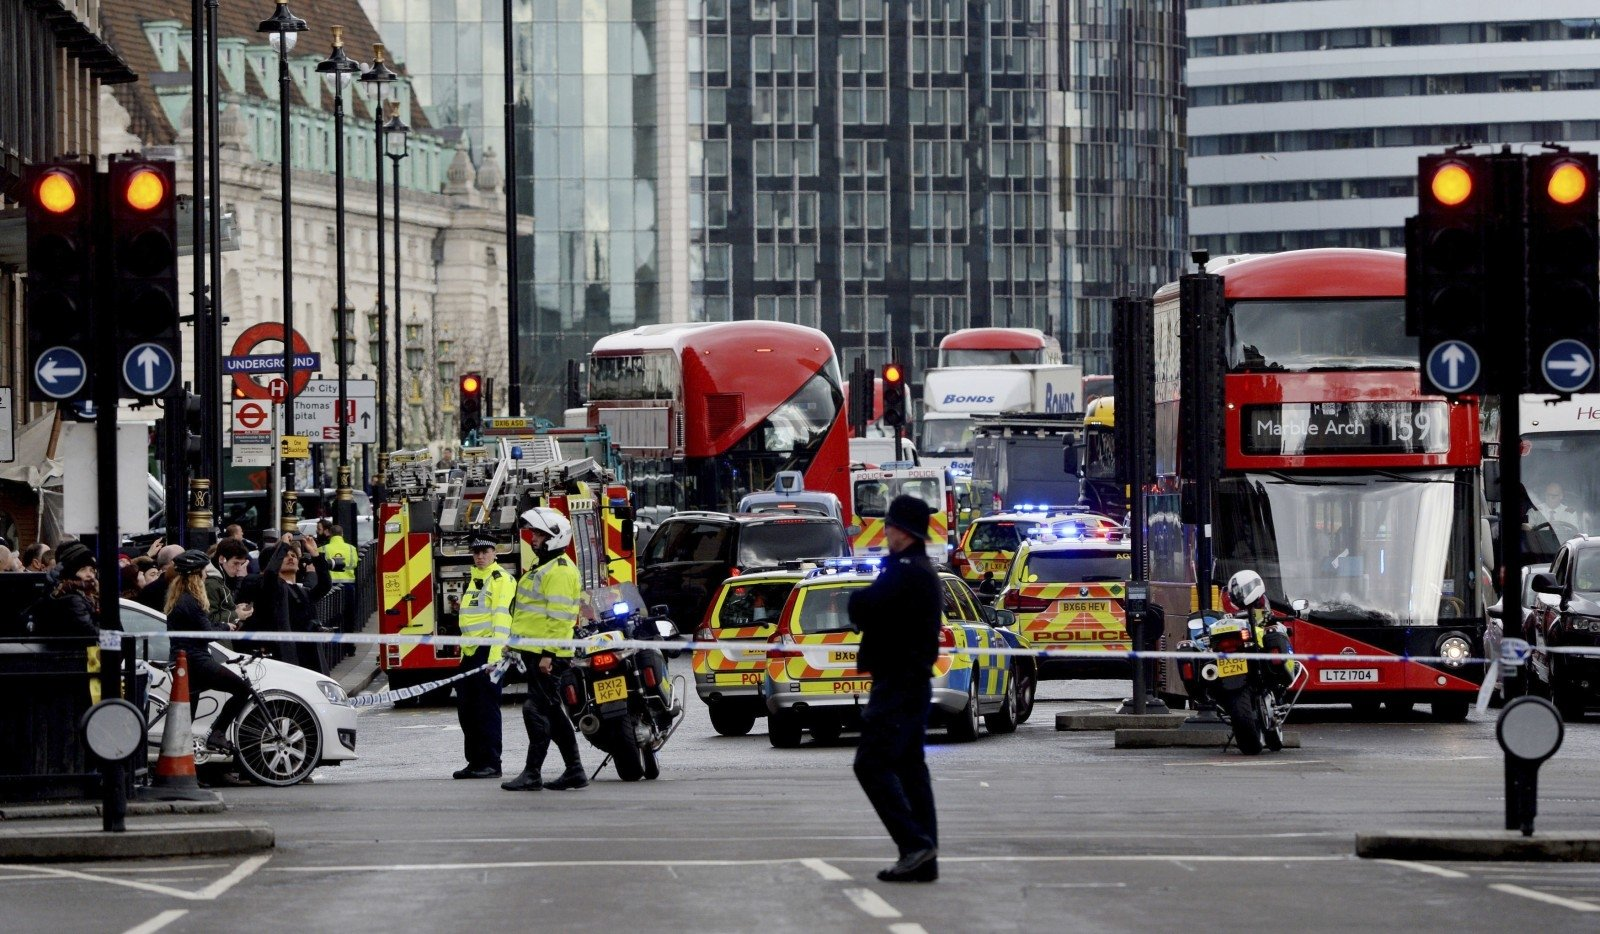 Уздания английского парламента произошел «террористический инцидент»